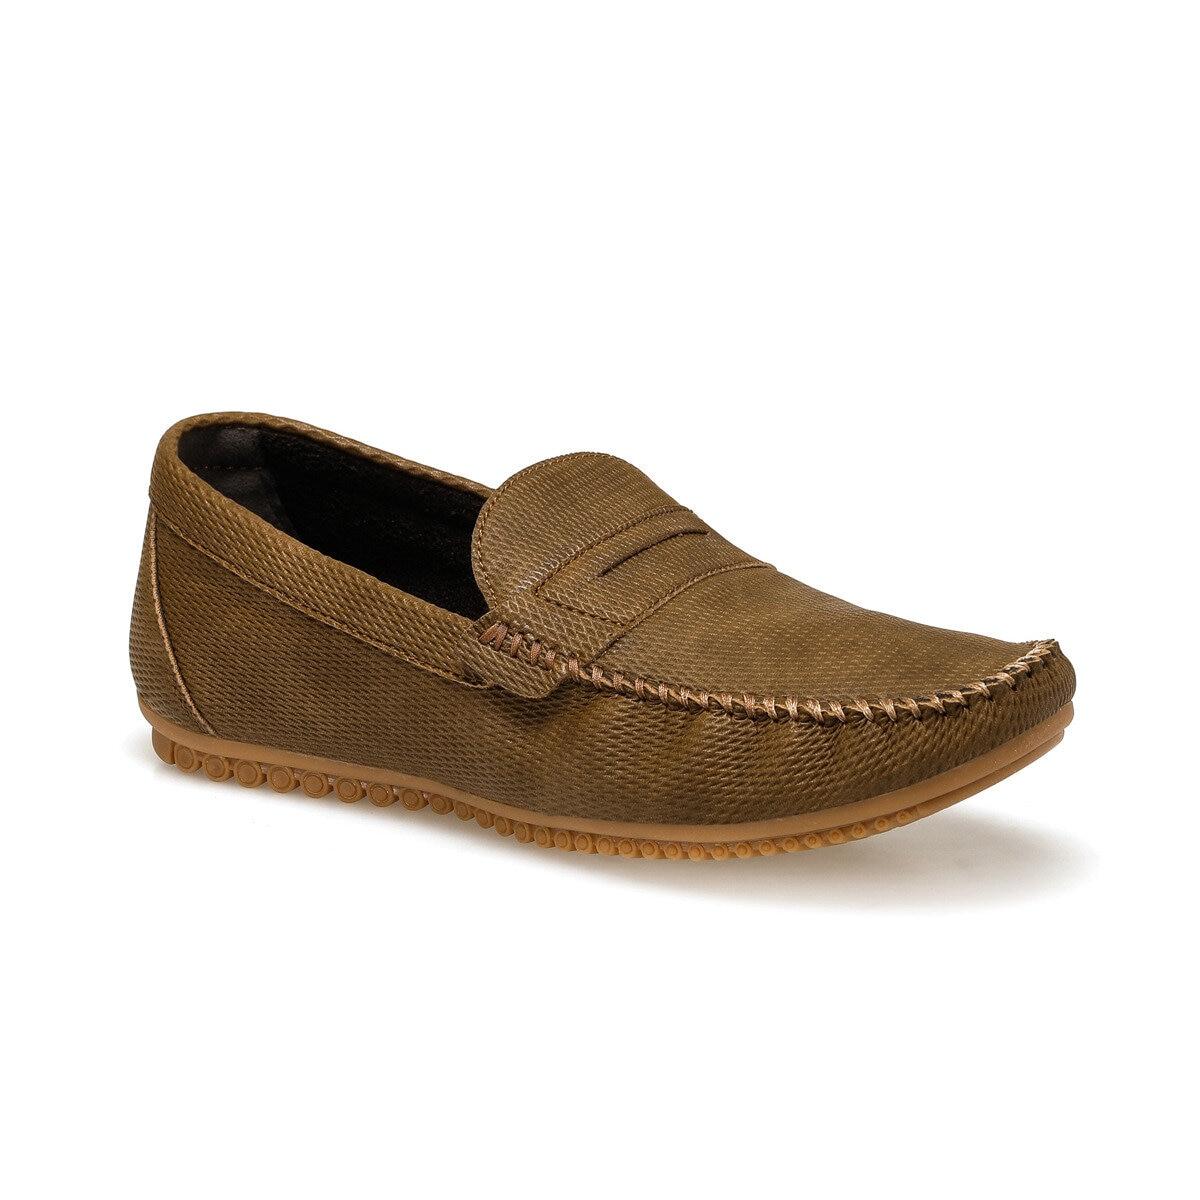 FLO MDL2 Sand Color Men Shoes Oxide